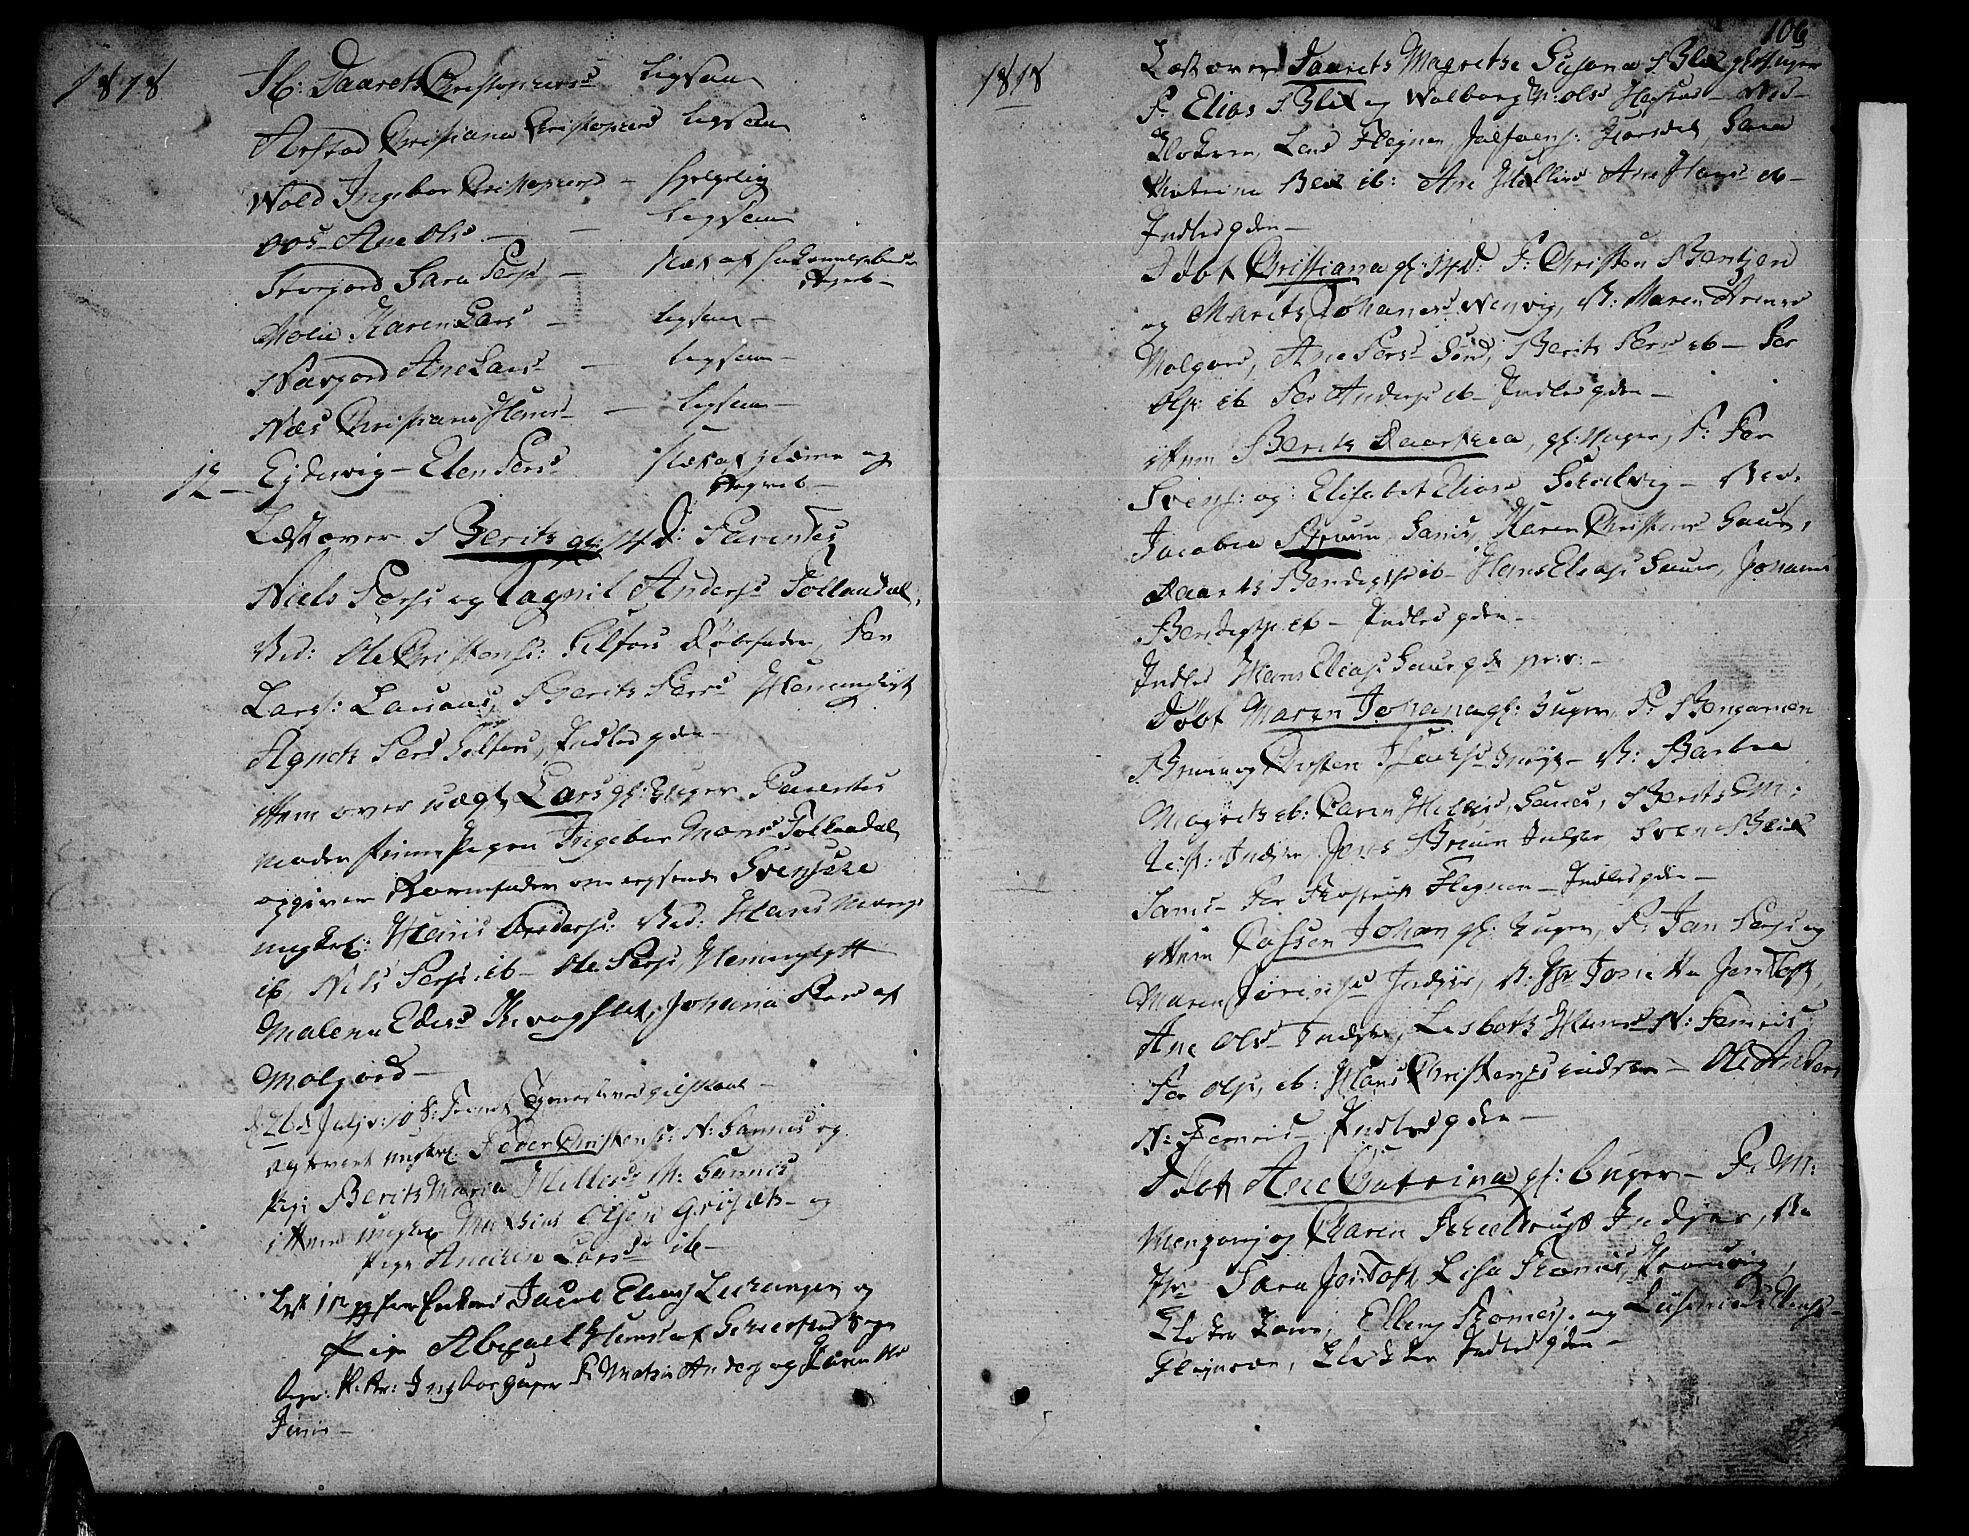 SAT, Ministerialprotokoller, klokkerbøker og fødselsregistre - Nordland, 805/L0095: Ministerialbok nr. 805A02, 1805-1826, s. 106